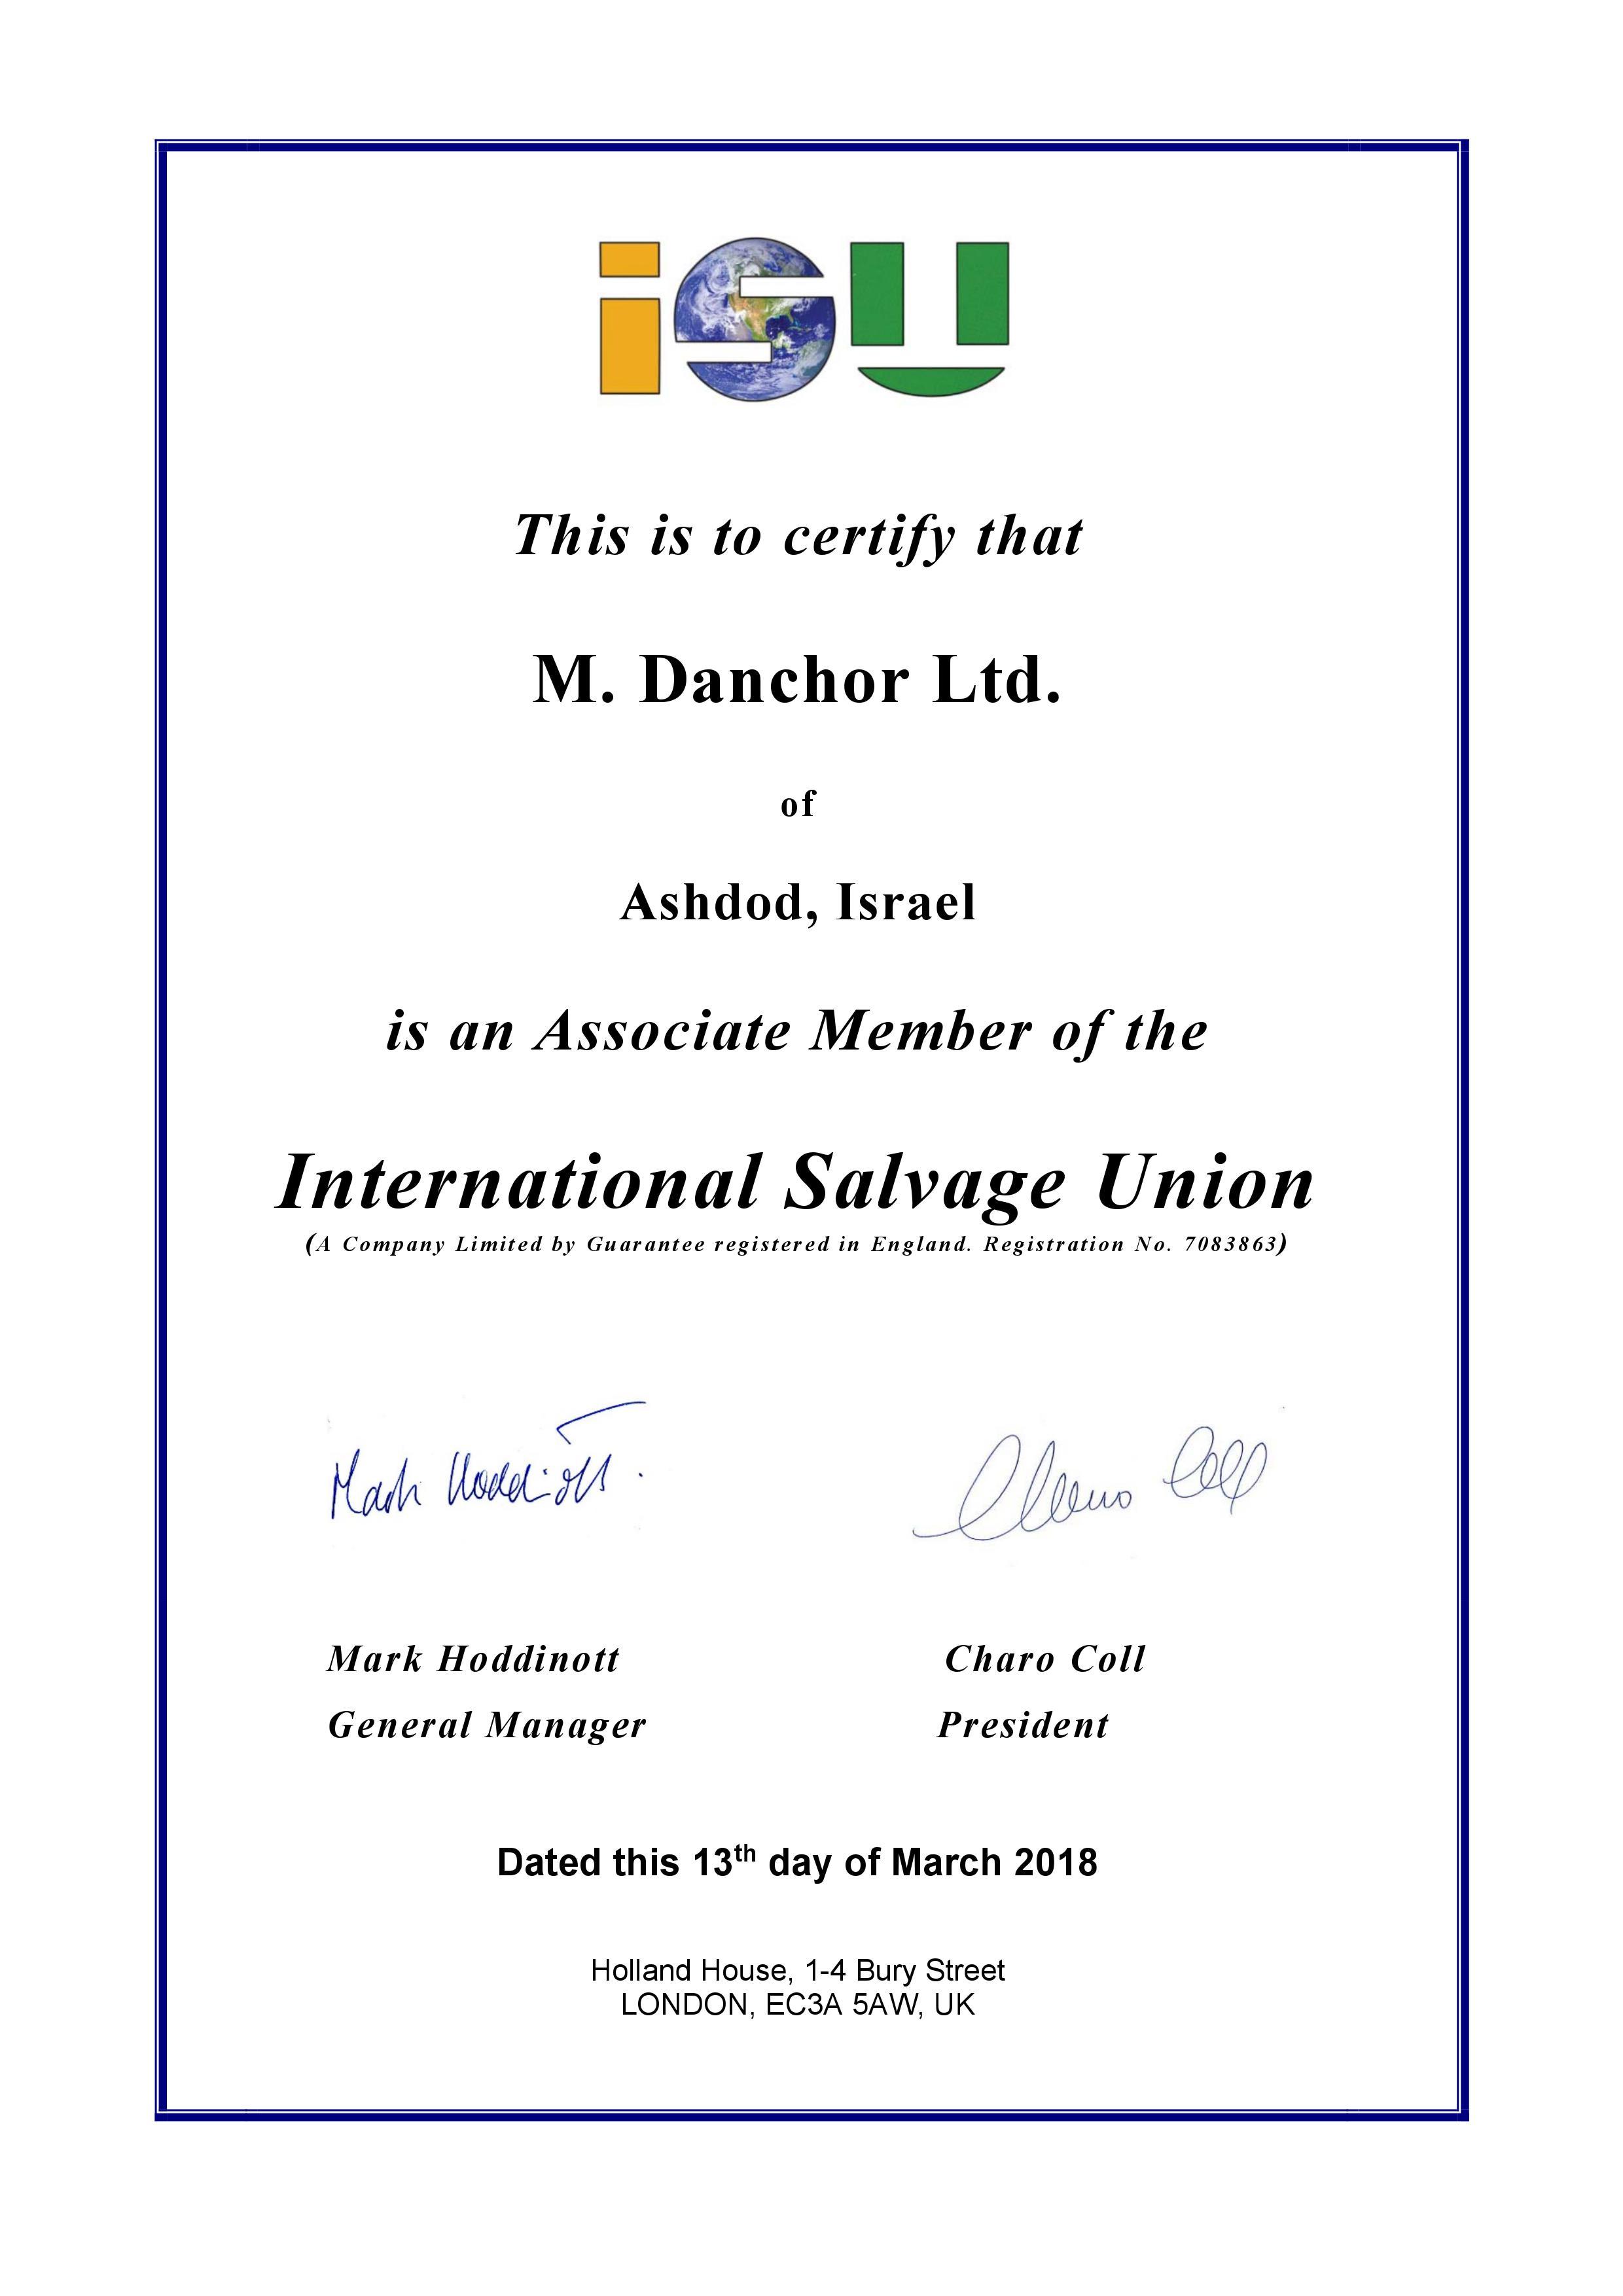 ISU Certification